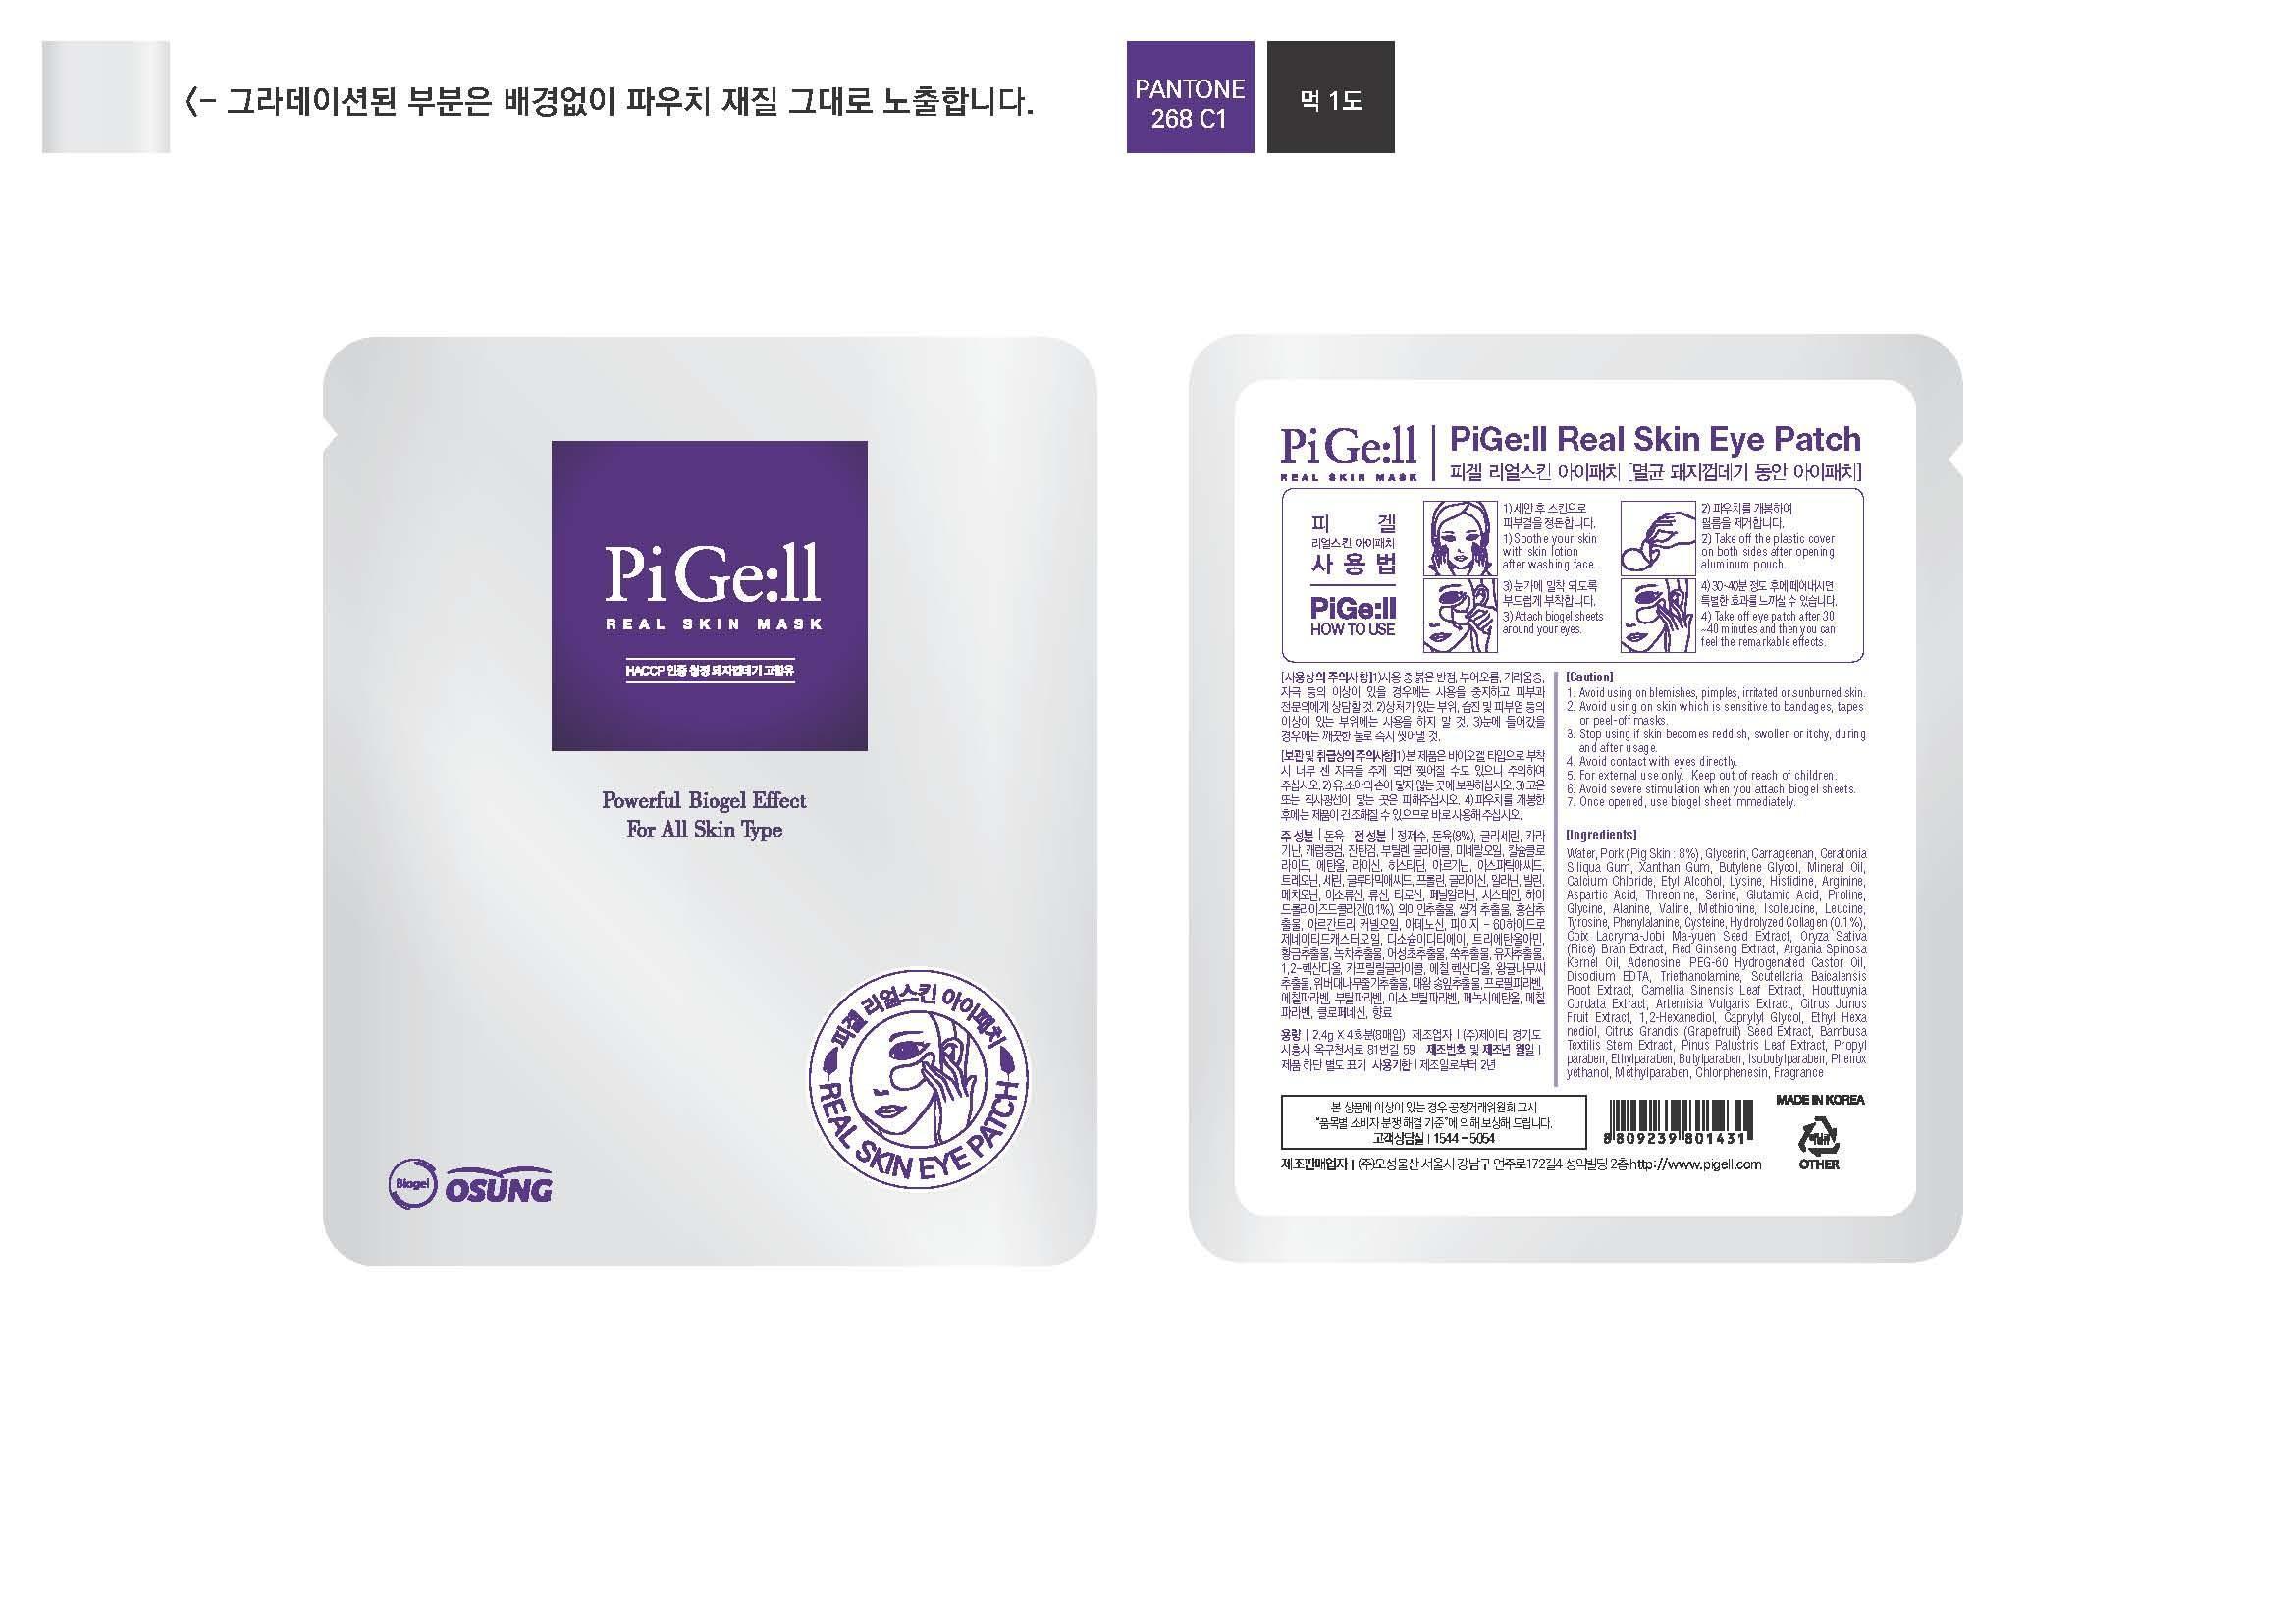 Pige Ll Real Skin Eye (Sus Scrofa Skin) Patch [Osung Co., Ltd]